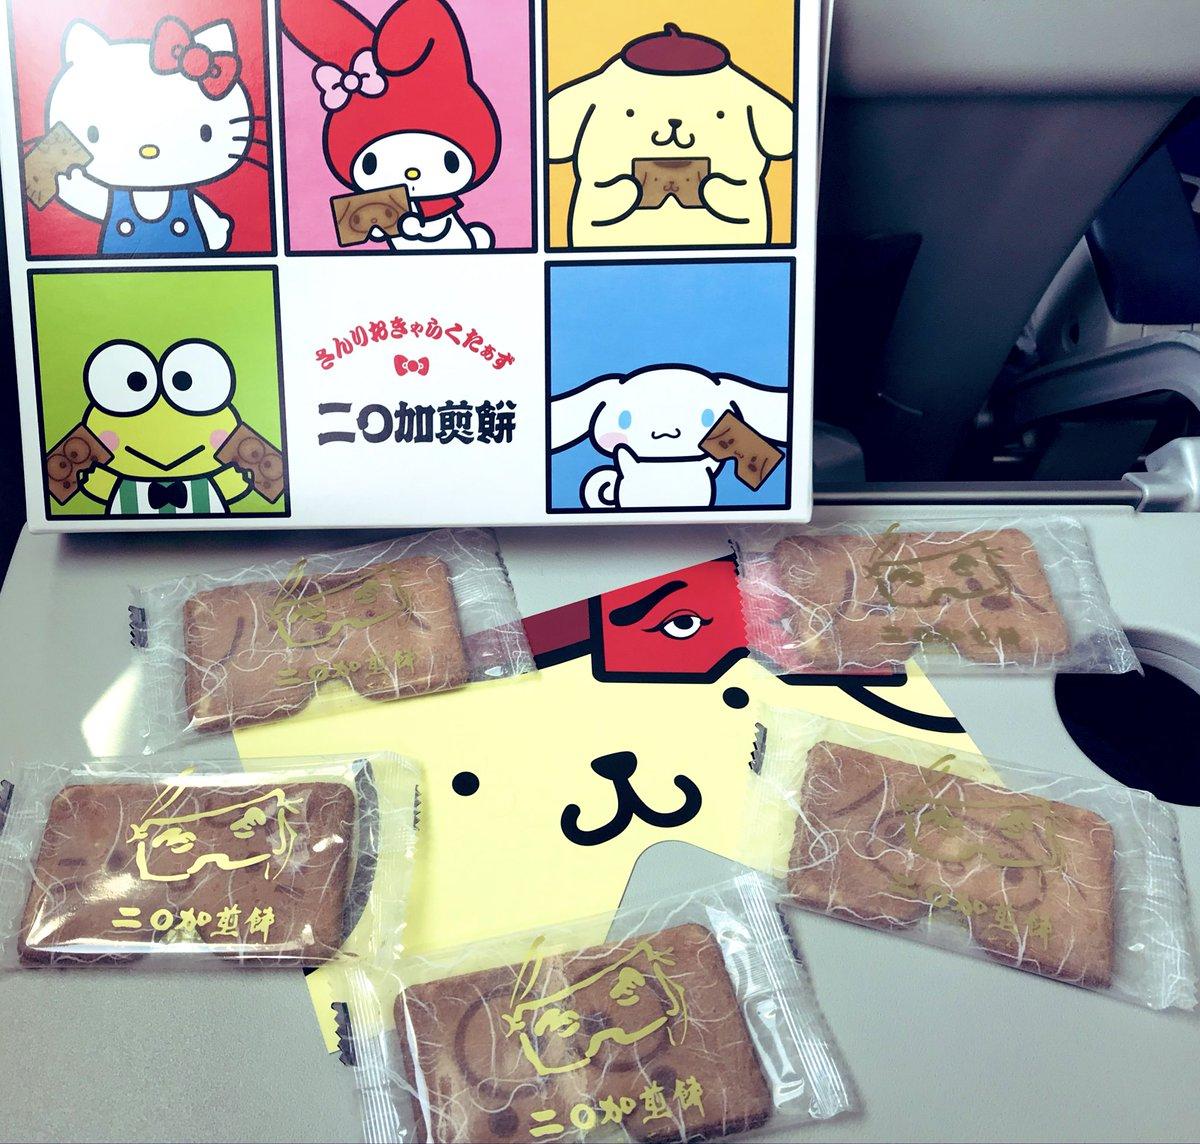 test ツイッターメディア - サンリオにわか煎餅🔥(かわいい) あまおうラスク、博多通りもん、めんべいのプレーンと九州醤油味!  福岡はご飯も美味しいけどお土産も最高\(^o^)/買い過ぎたので金沢→大阪→岡山行く方は貰ってね🙋♀️笑 https://t.co/ySls3Zu5CL